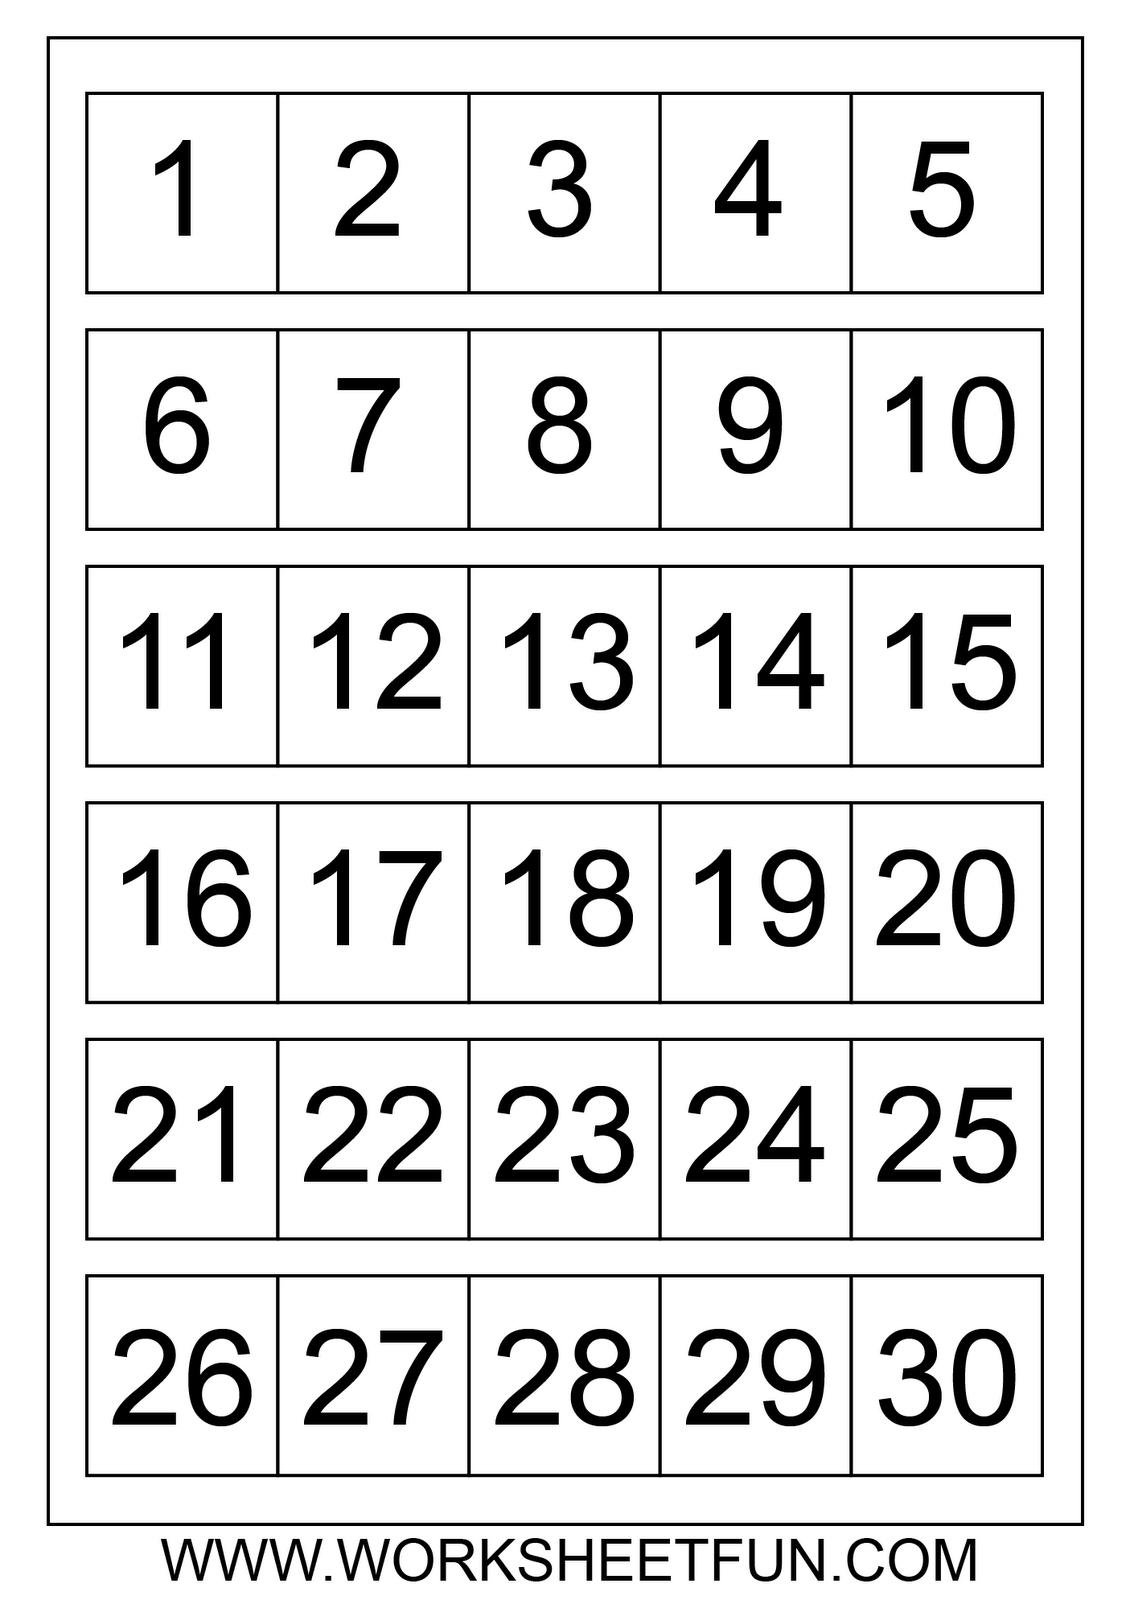 Printable Numbers 1 31 For Calendar – Calendar Inspiration Free Printable Calendar Numbers 1 31